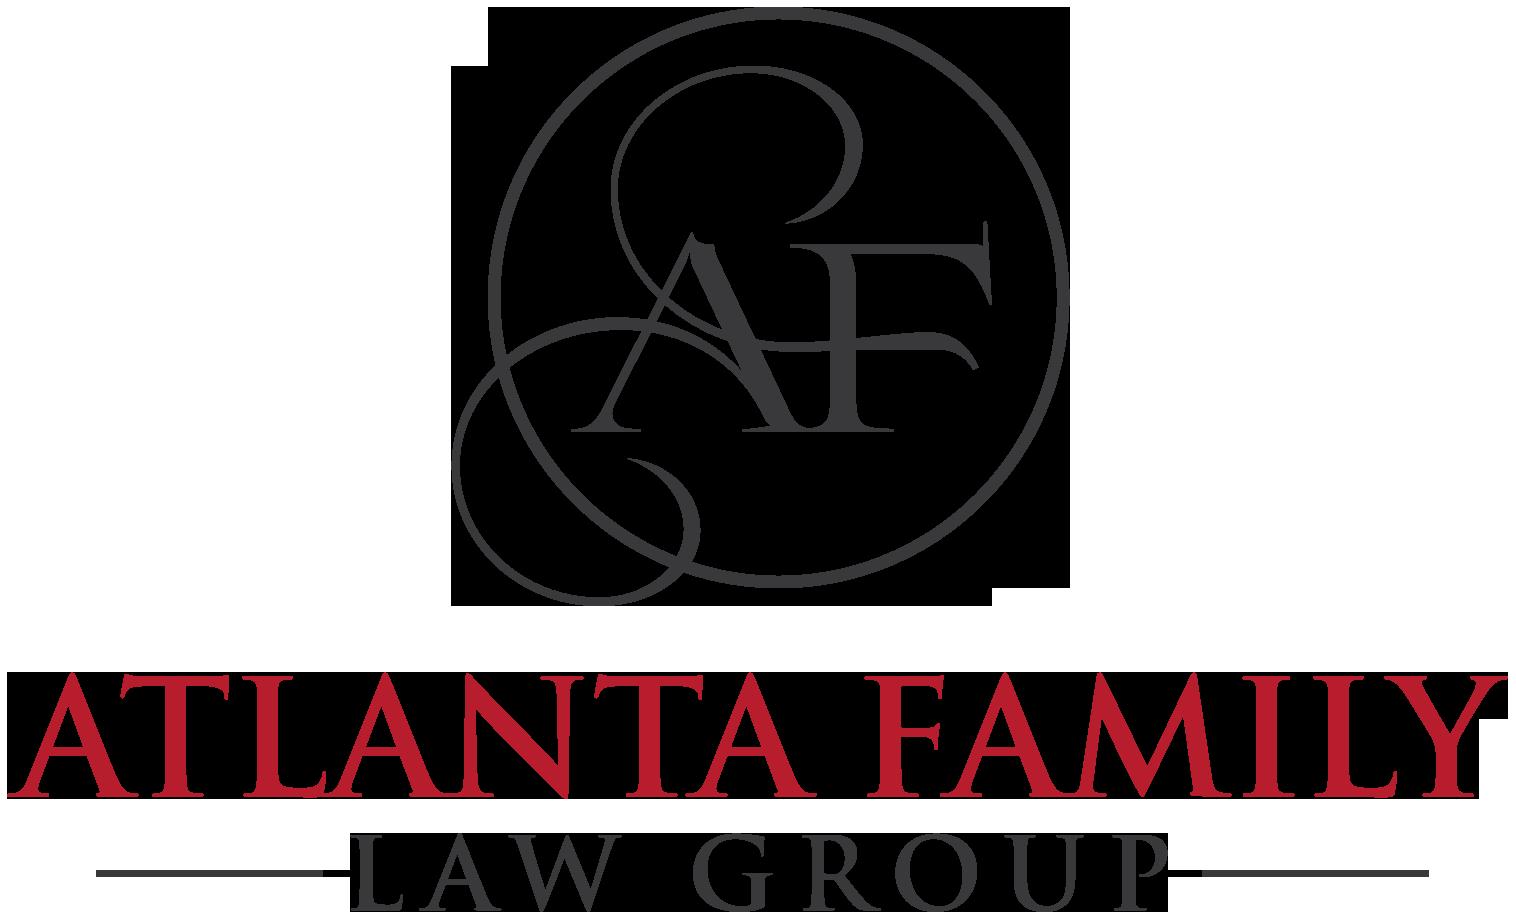 Atlanta Family Law Group LLC